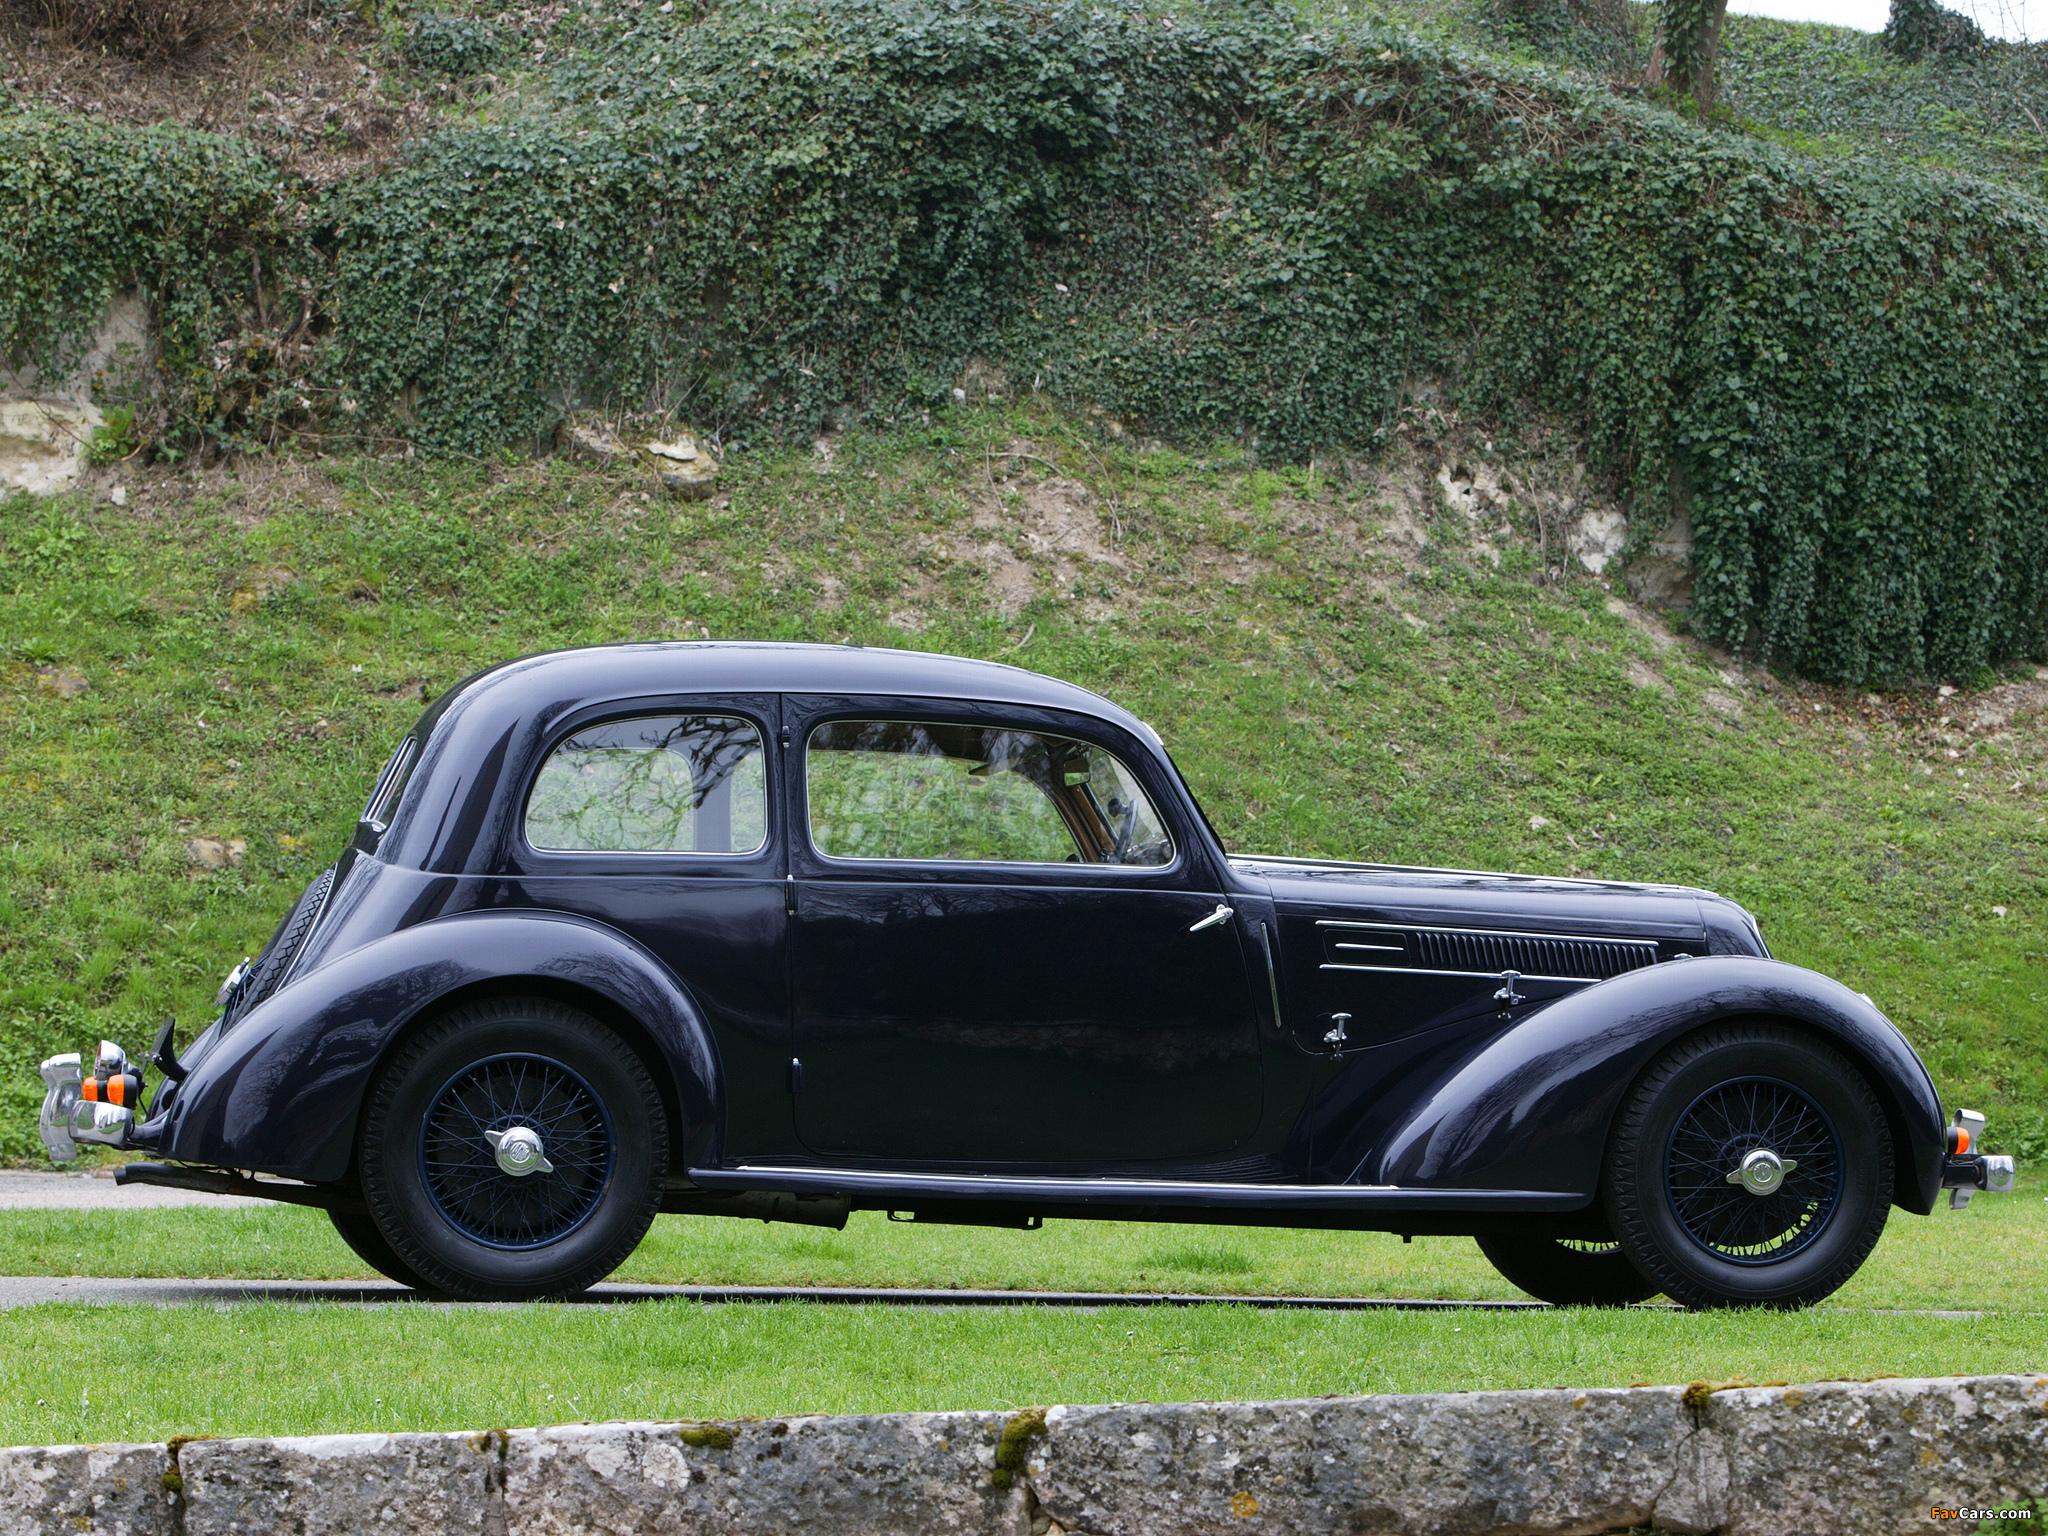 http://img.favcars.com/lancia/astura/pictures_lancia_astura_1933_1.jpg